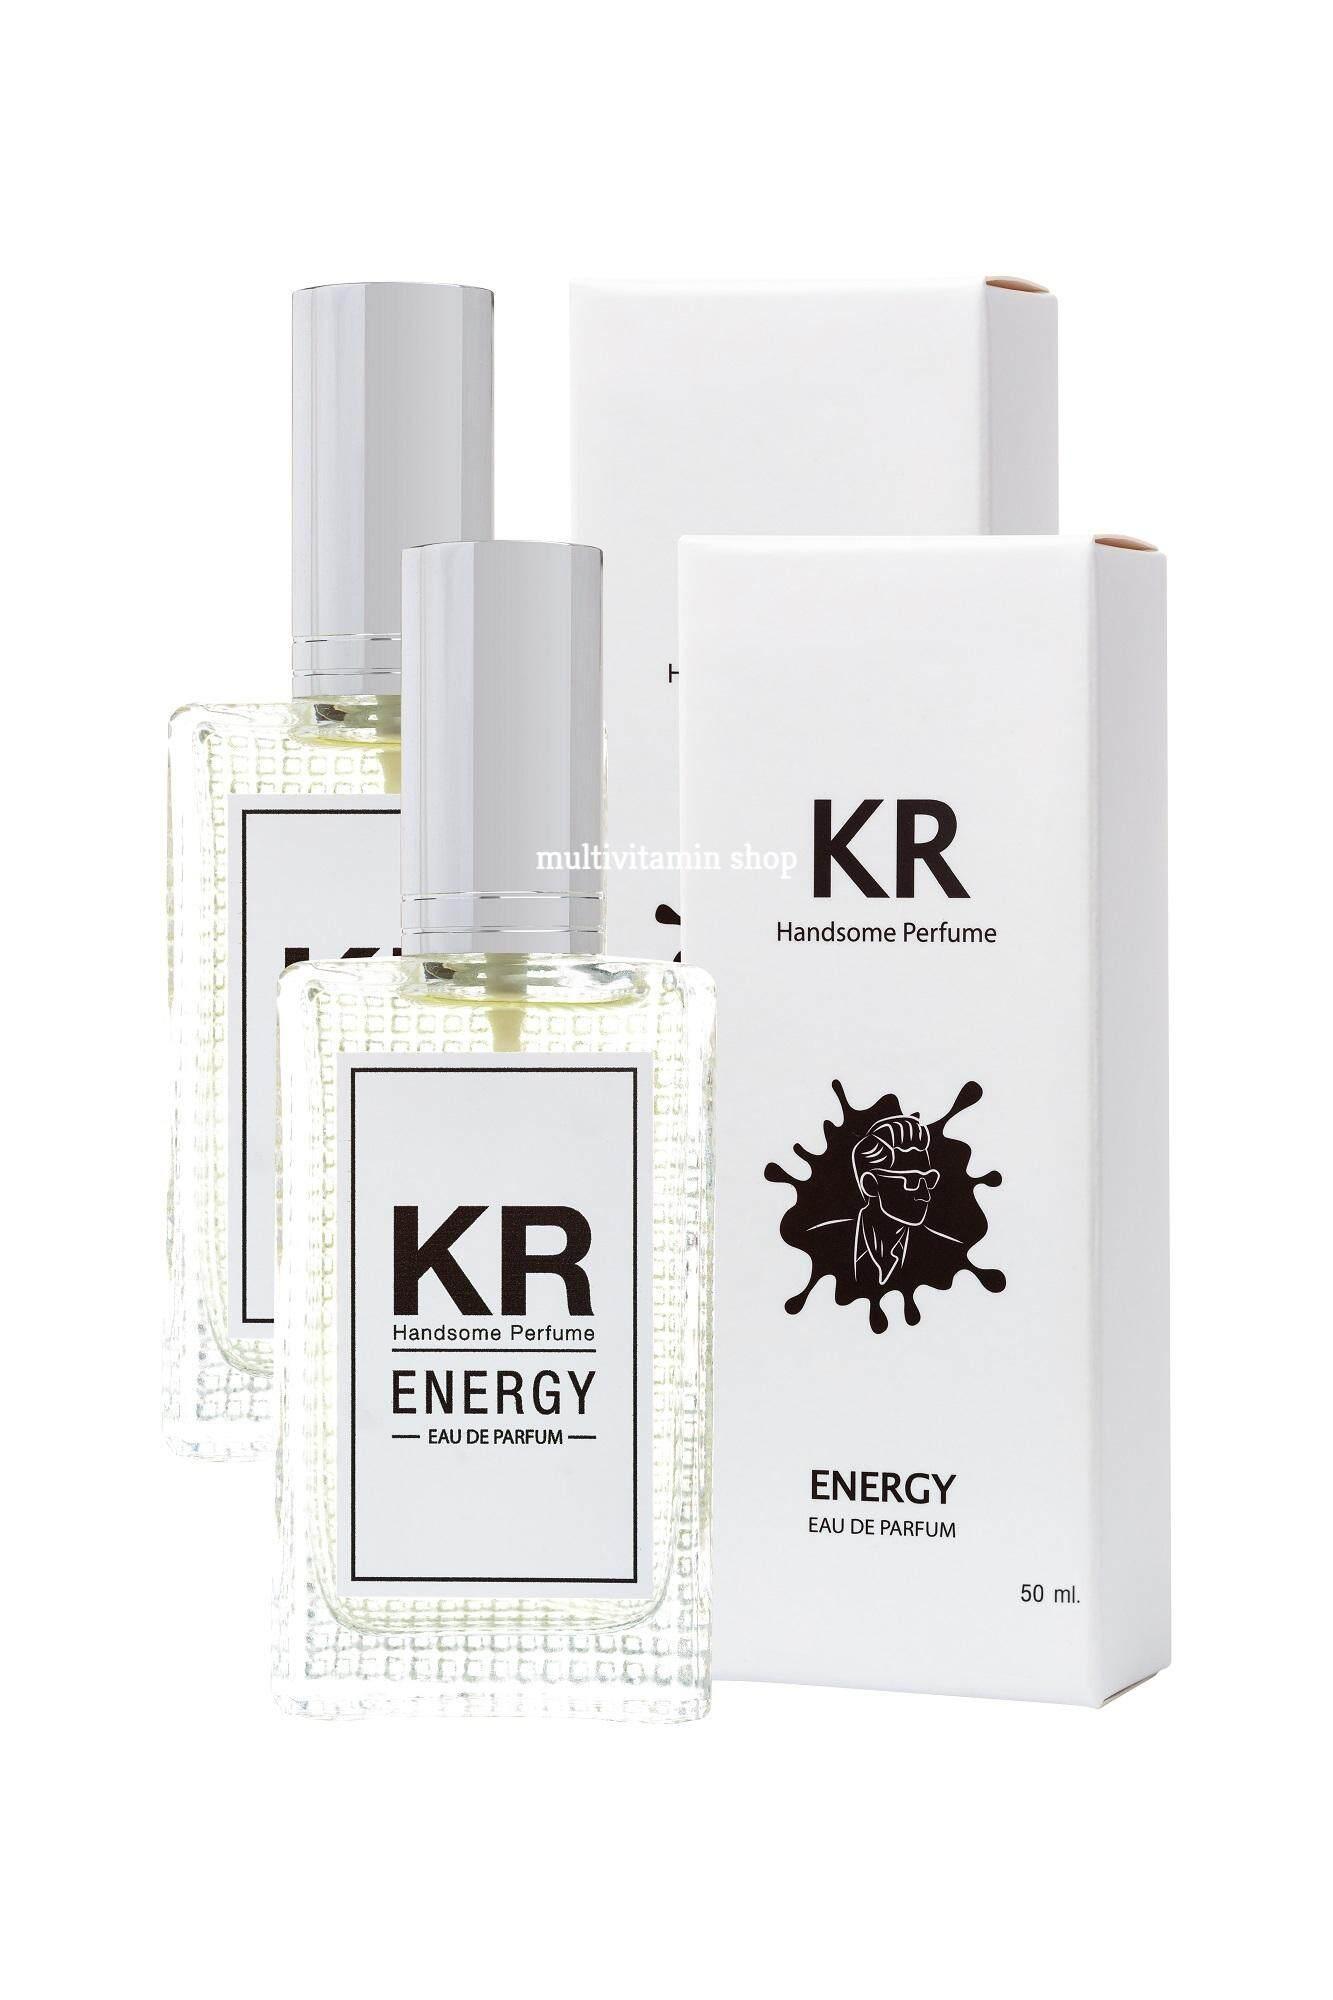 KR Handsome Perfume น้ำหอม น้ำหอมผู้ชาย น้ำหอมสำหรับผู้ชาย น้ำหอมผู้หญิง น้ำหอมสำหรับผู้หญิง ติดทนนาน กลิ่น ENERGY กลิ่นหอมสดชื่น แนวสปอร์ต ไม่ฉุน หอมนาน 8-12 ชั่วโมง ขนาด 50 ml. 2 ขวด